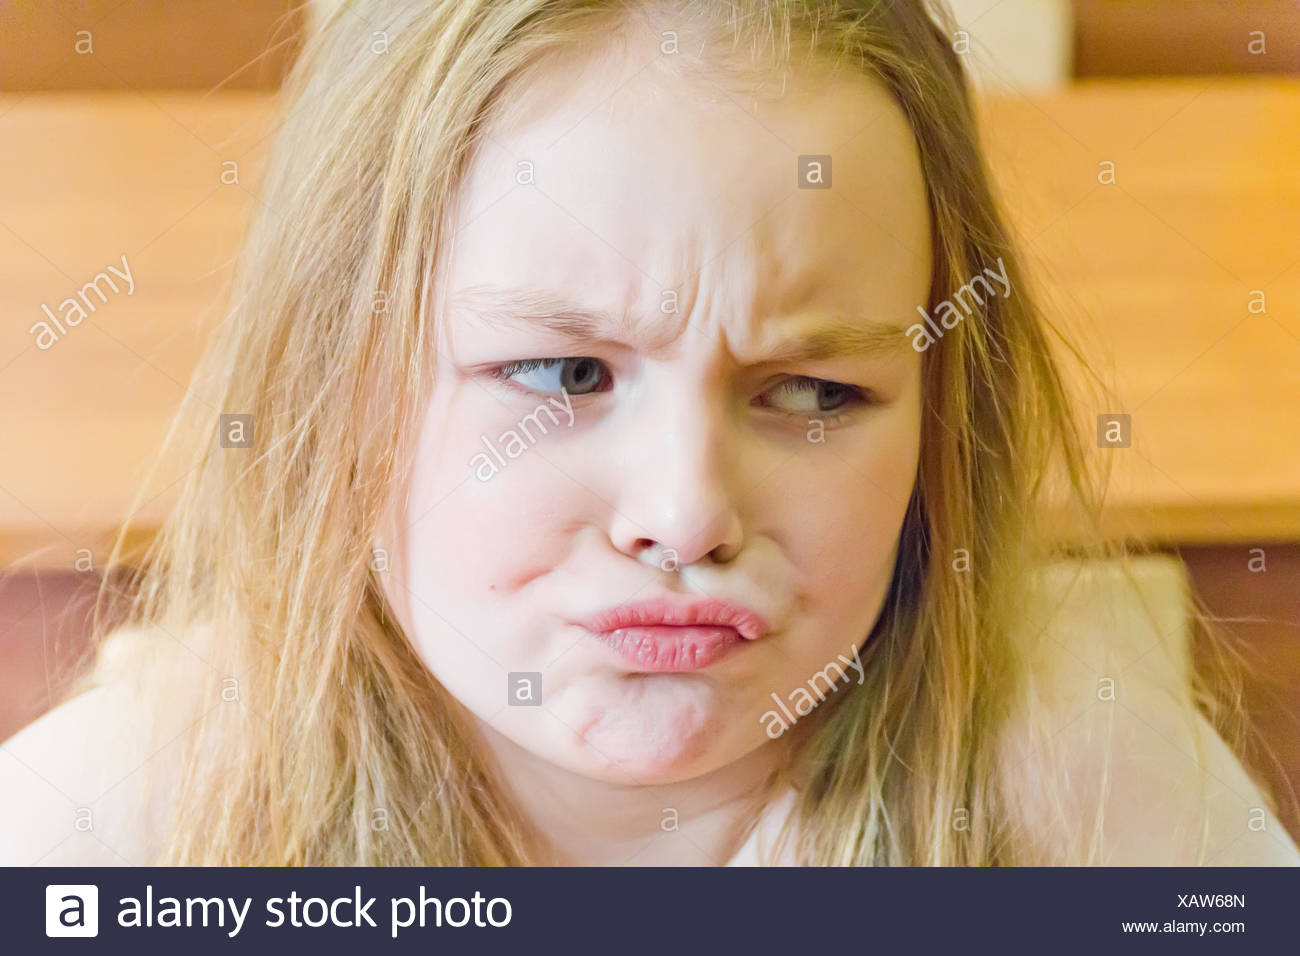 Discontented younger schoolgirl - Stock Image